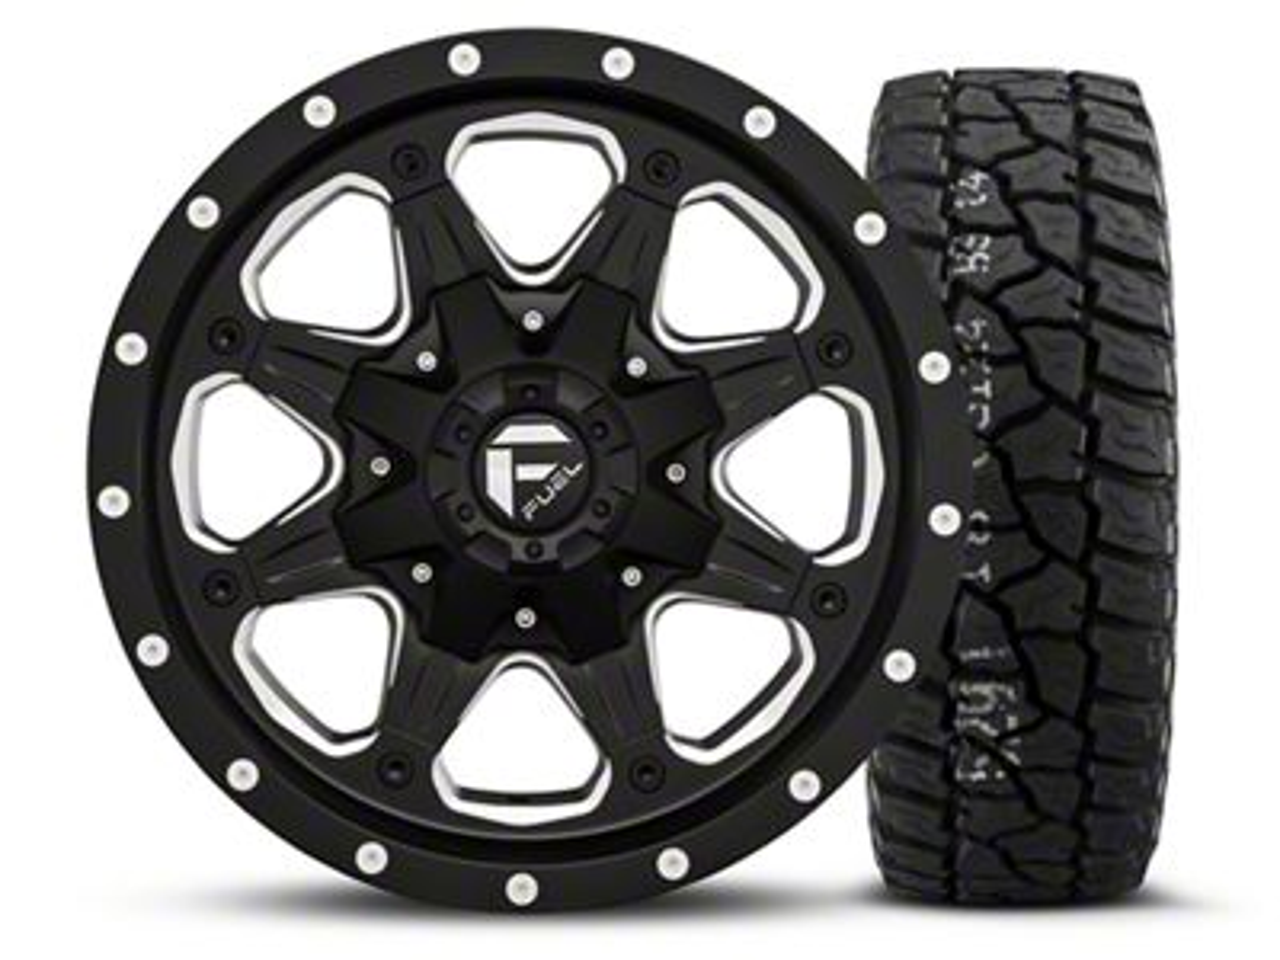 Fuel Wheels Boost - Black/Milled 16x8 Wheel - and Mickey Thompson Baja ATX P3 Tire - 315/75R16 (07-18 Jeep Wrangler JK)